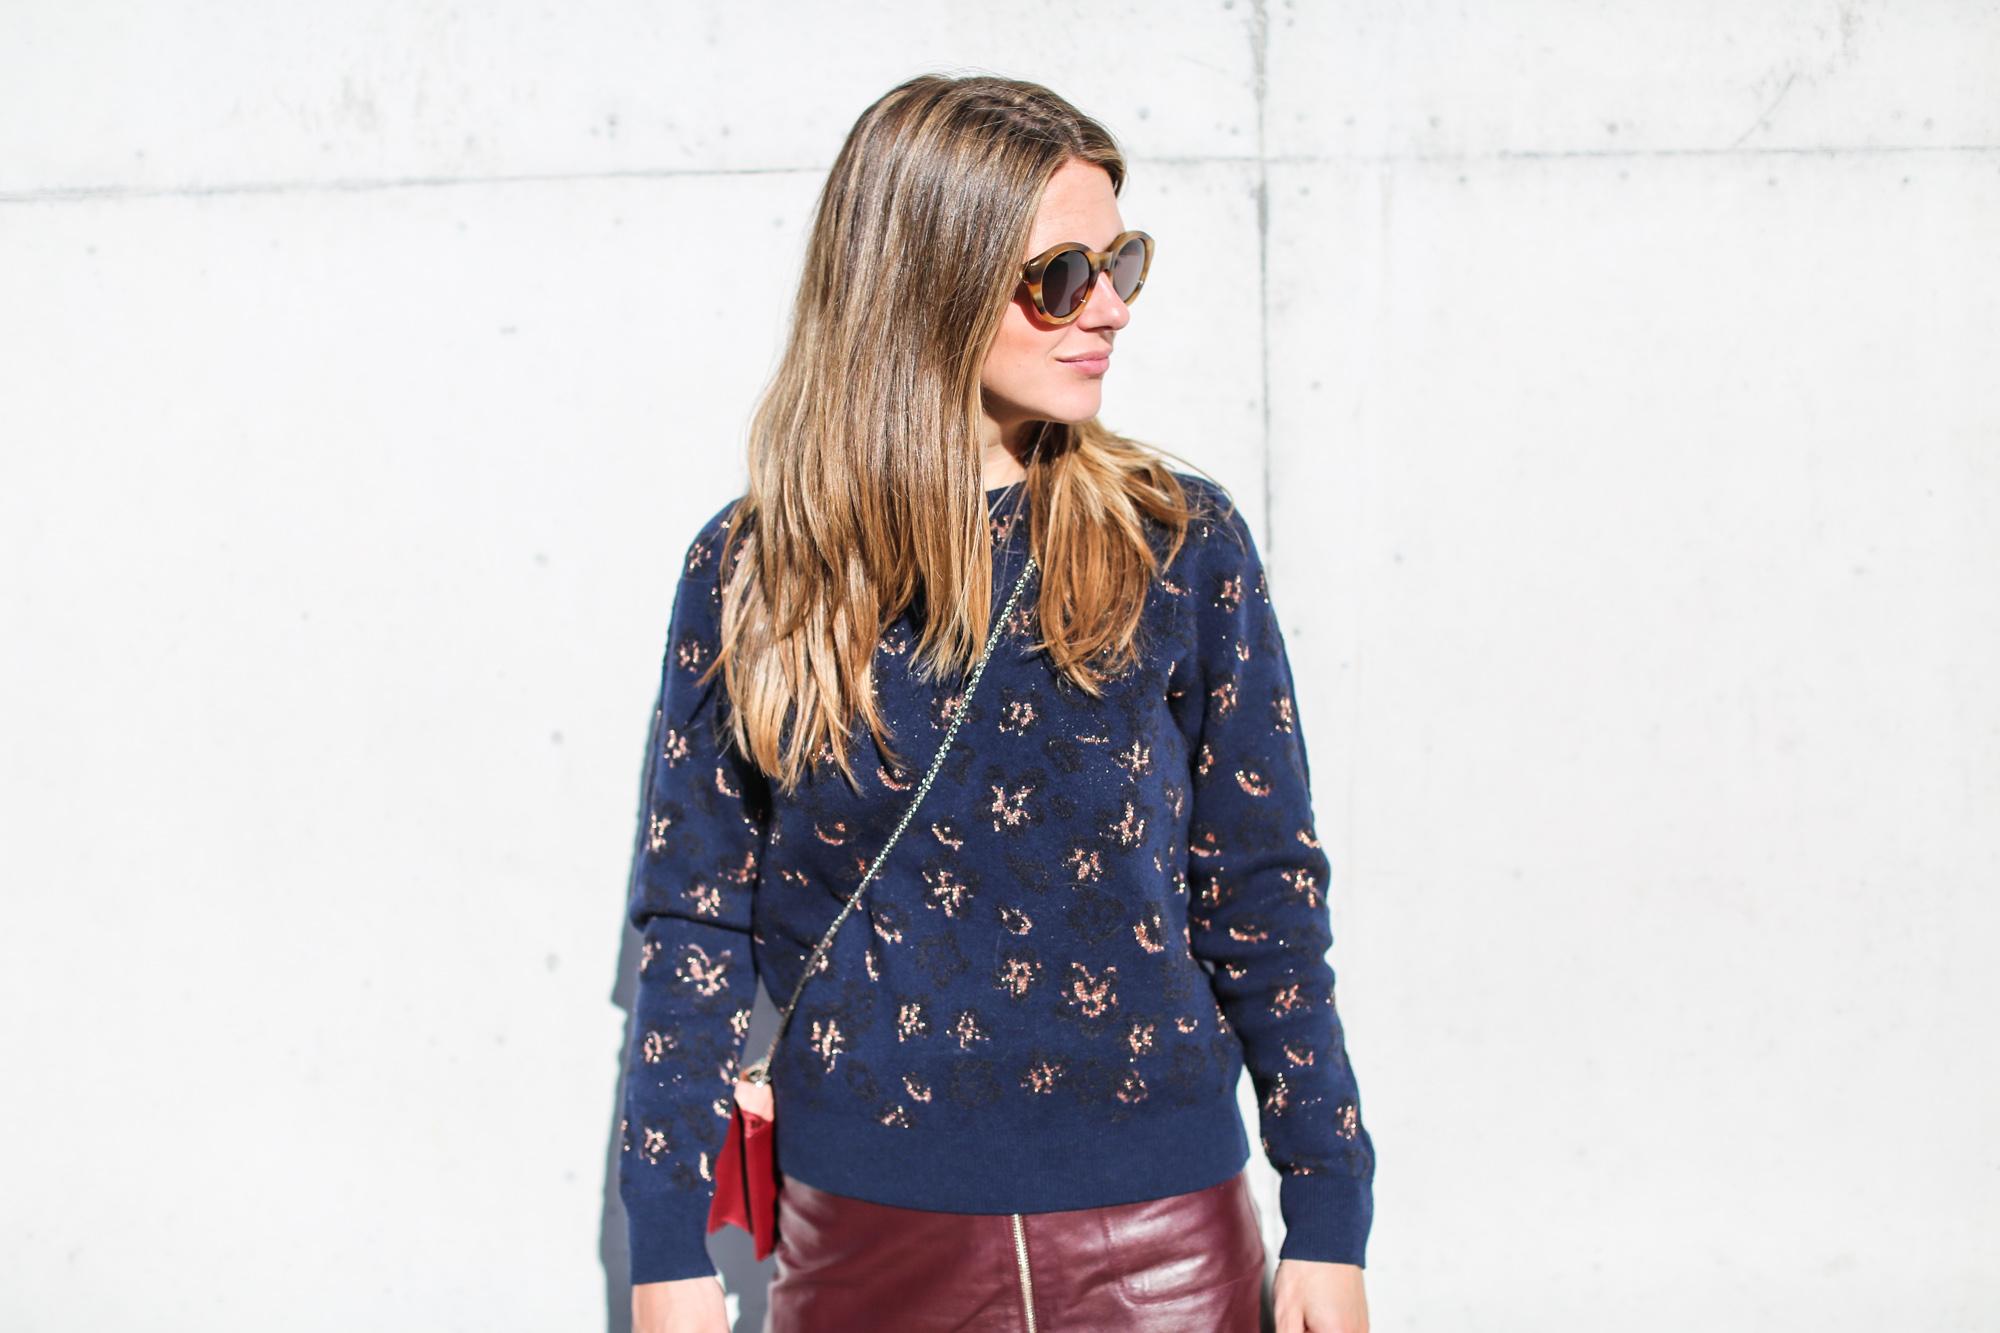 Clochet_fashionblogger_streetstyle_andotherstories_metallicflowersknit_heroscarf_leatherminiskirt-9